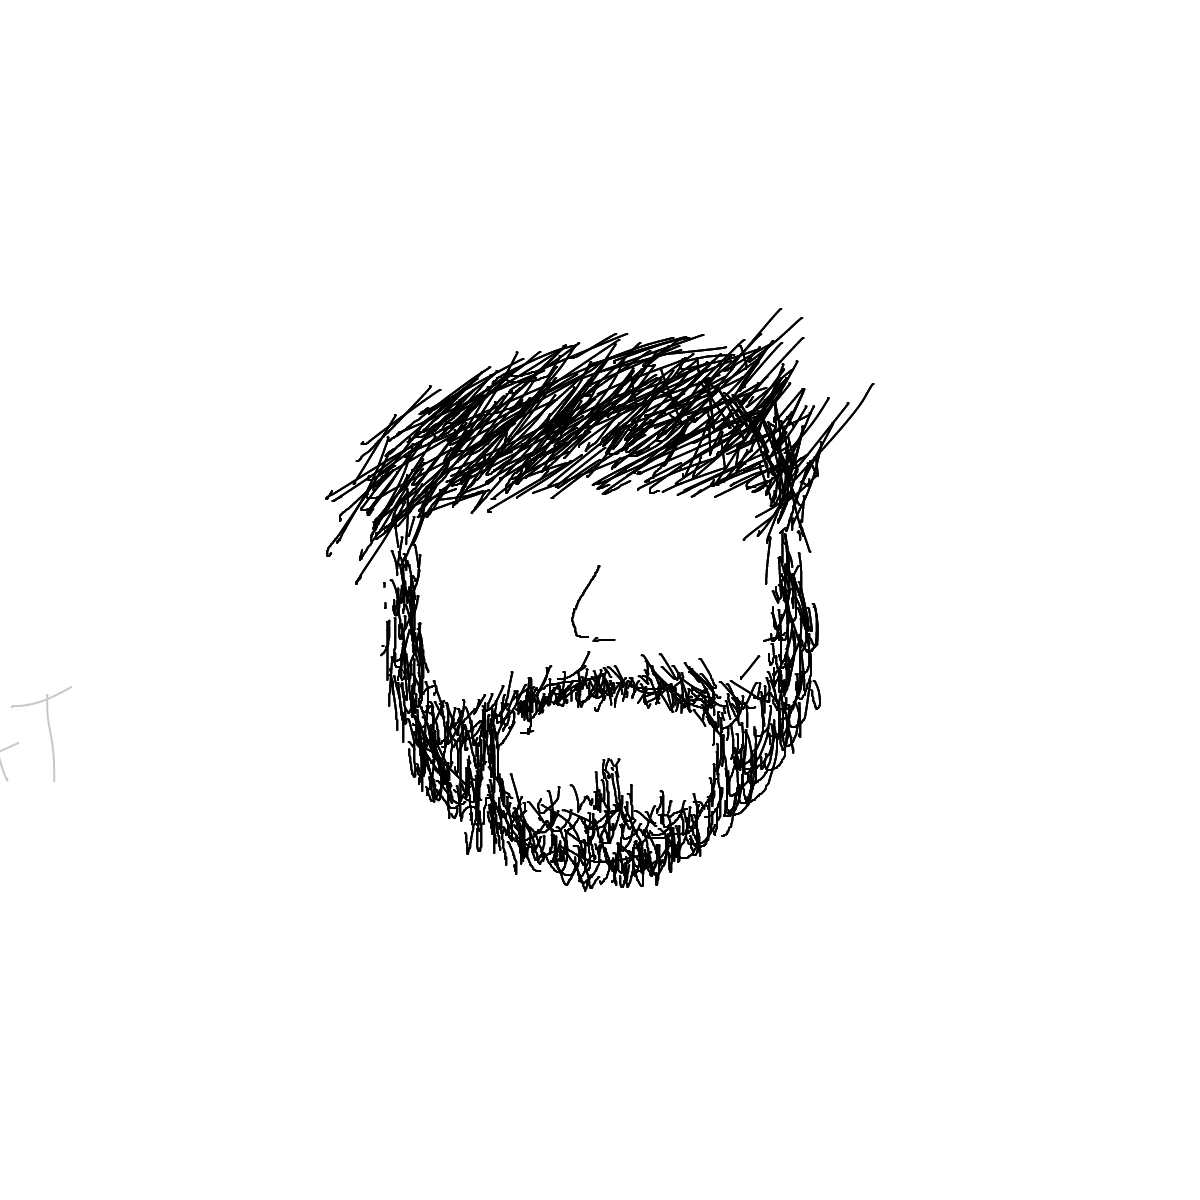 BAAAM drawing#15328 lat:53.5015449523925800lng: -113.4236221313476600